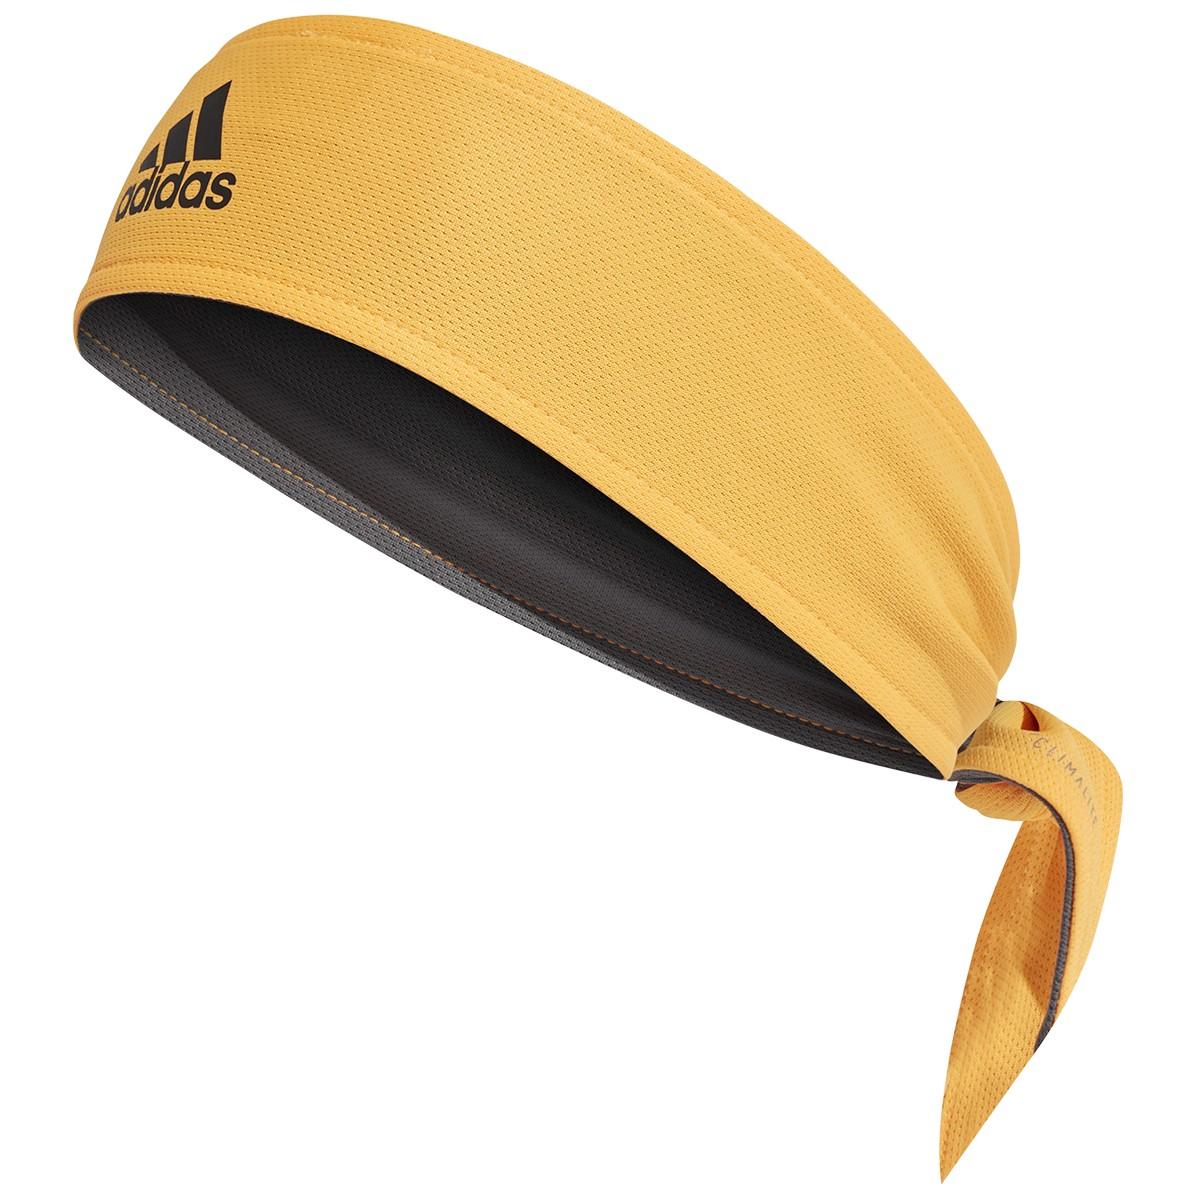 Bandana adidas tennis